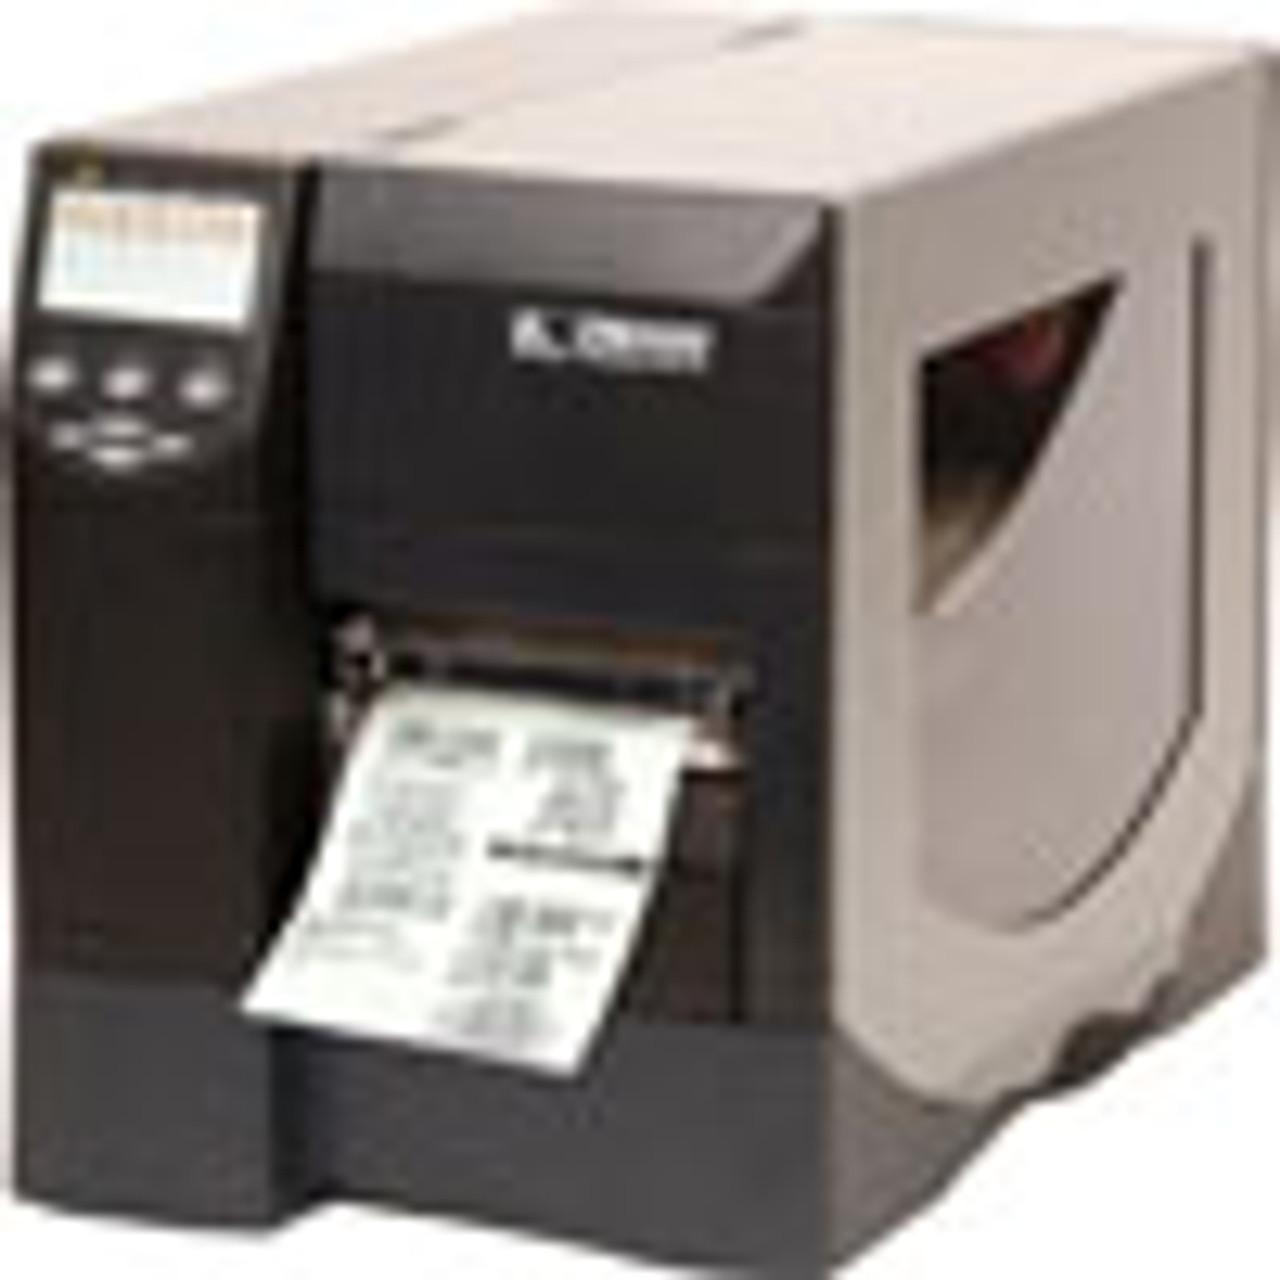 ZM400 Printers